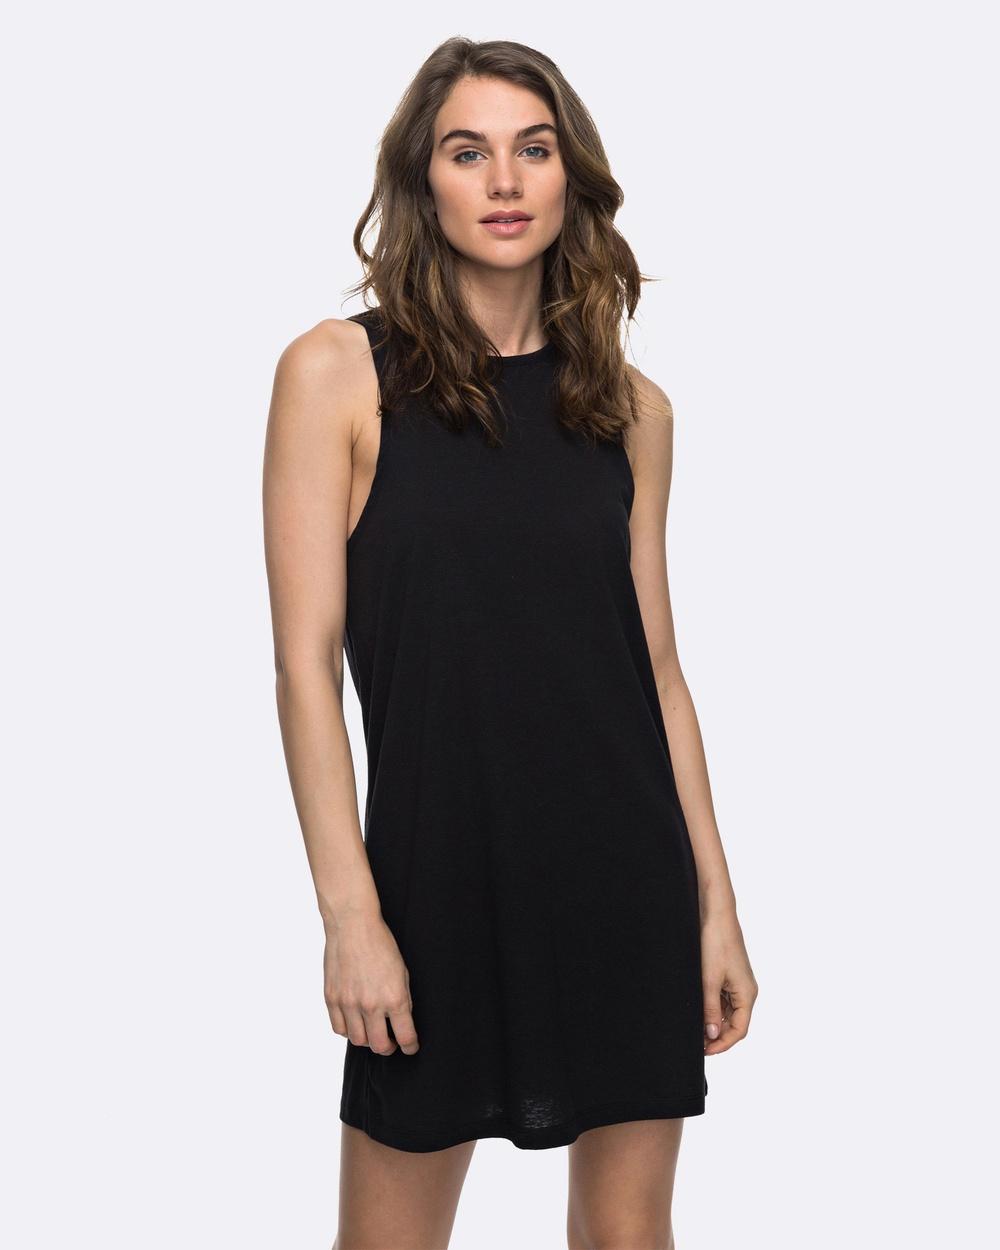 Roxy Womens Just Simple Solid Tank Dress Swimwear Anthracite Womens Just Simple Solid Tank Dress